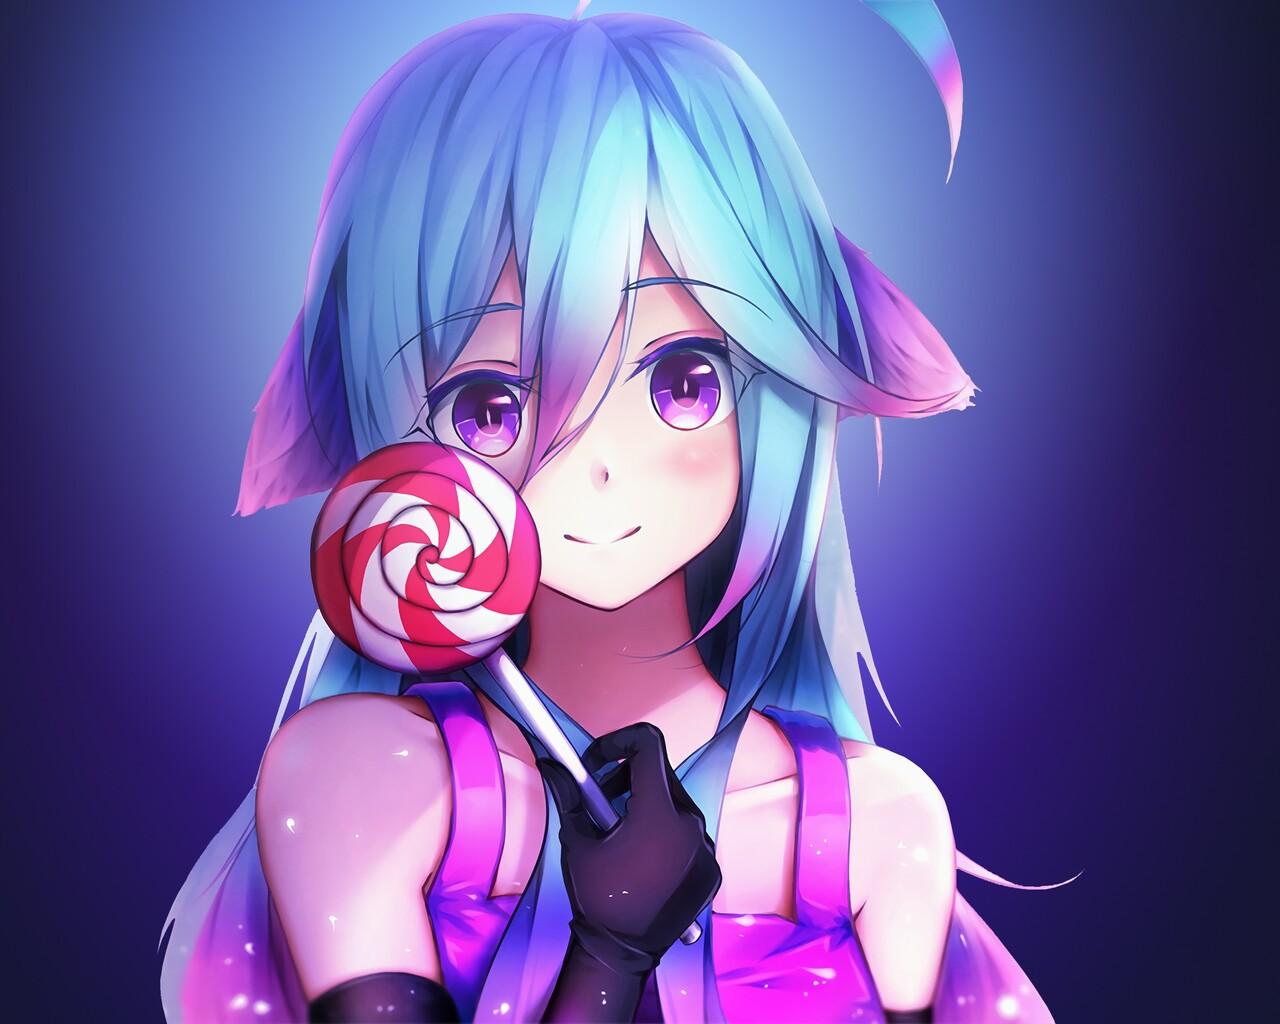 1280x1024 anime girl cute rainbows and lolipop 1280x1024